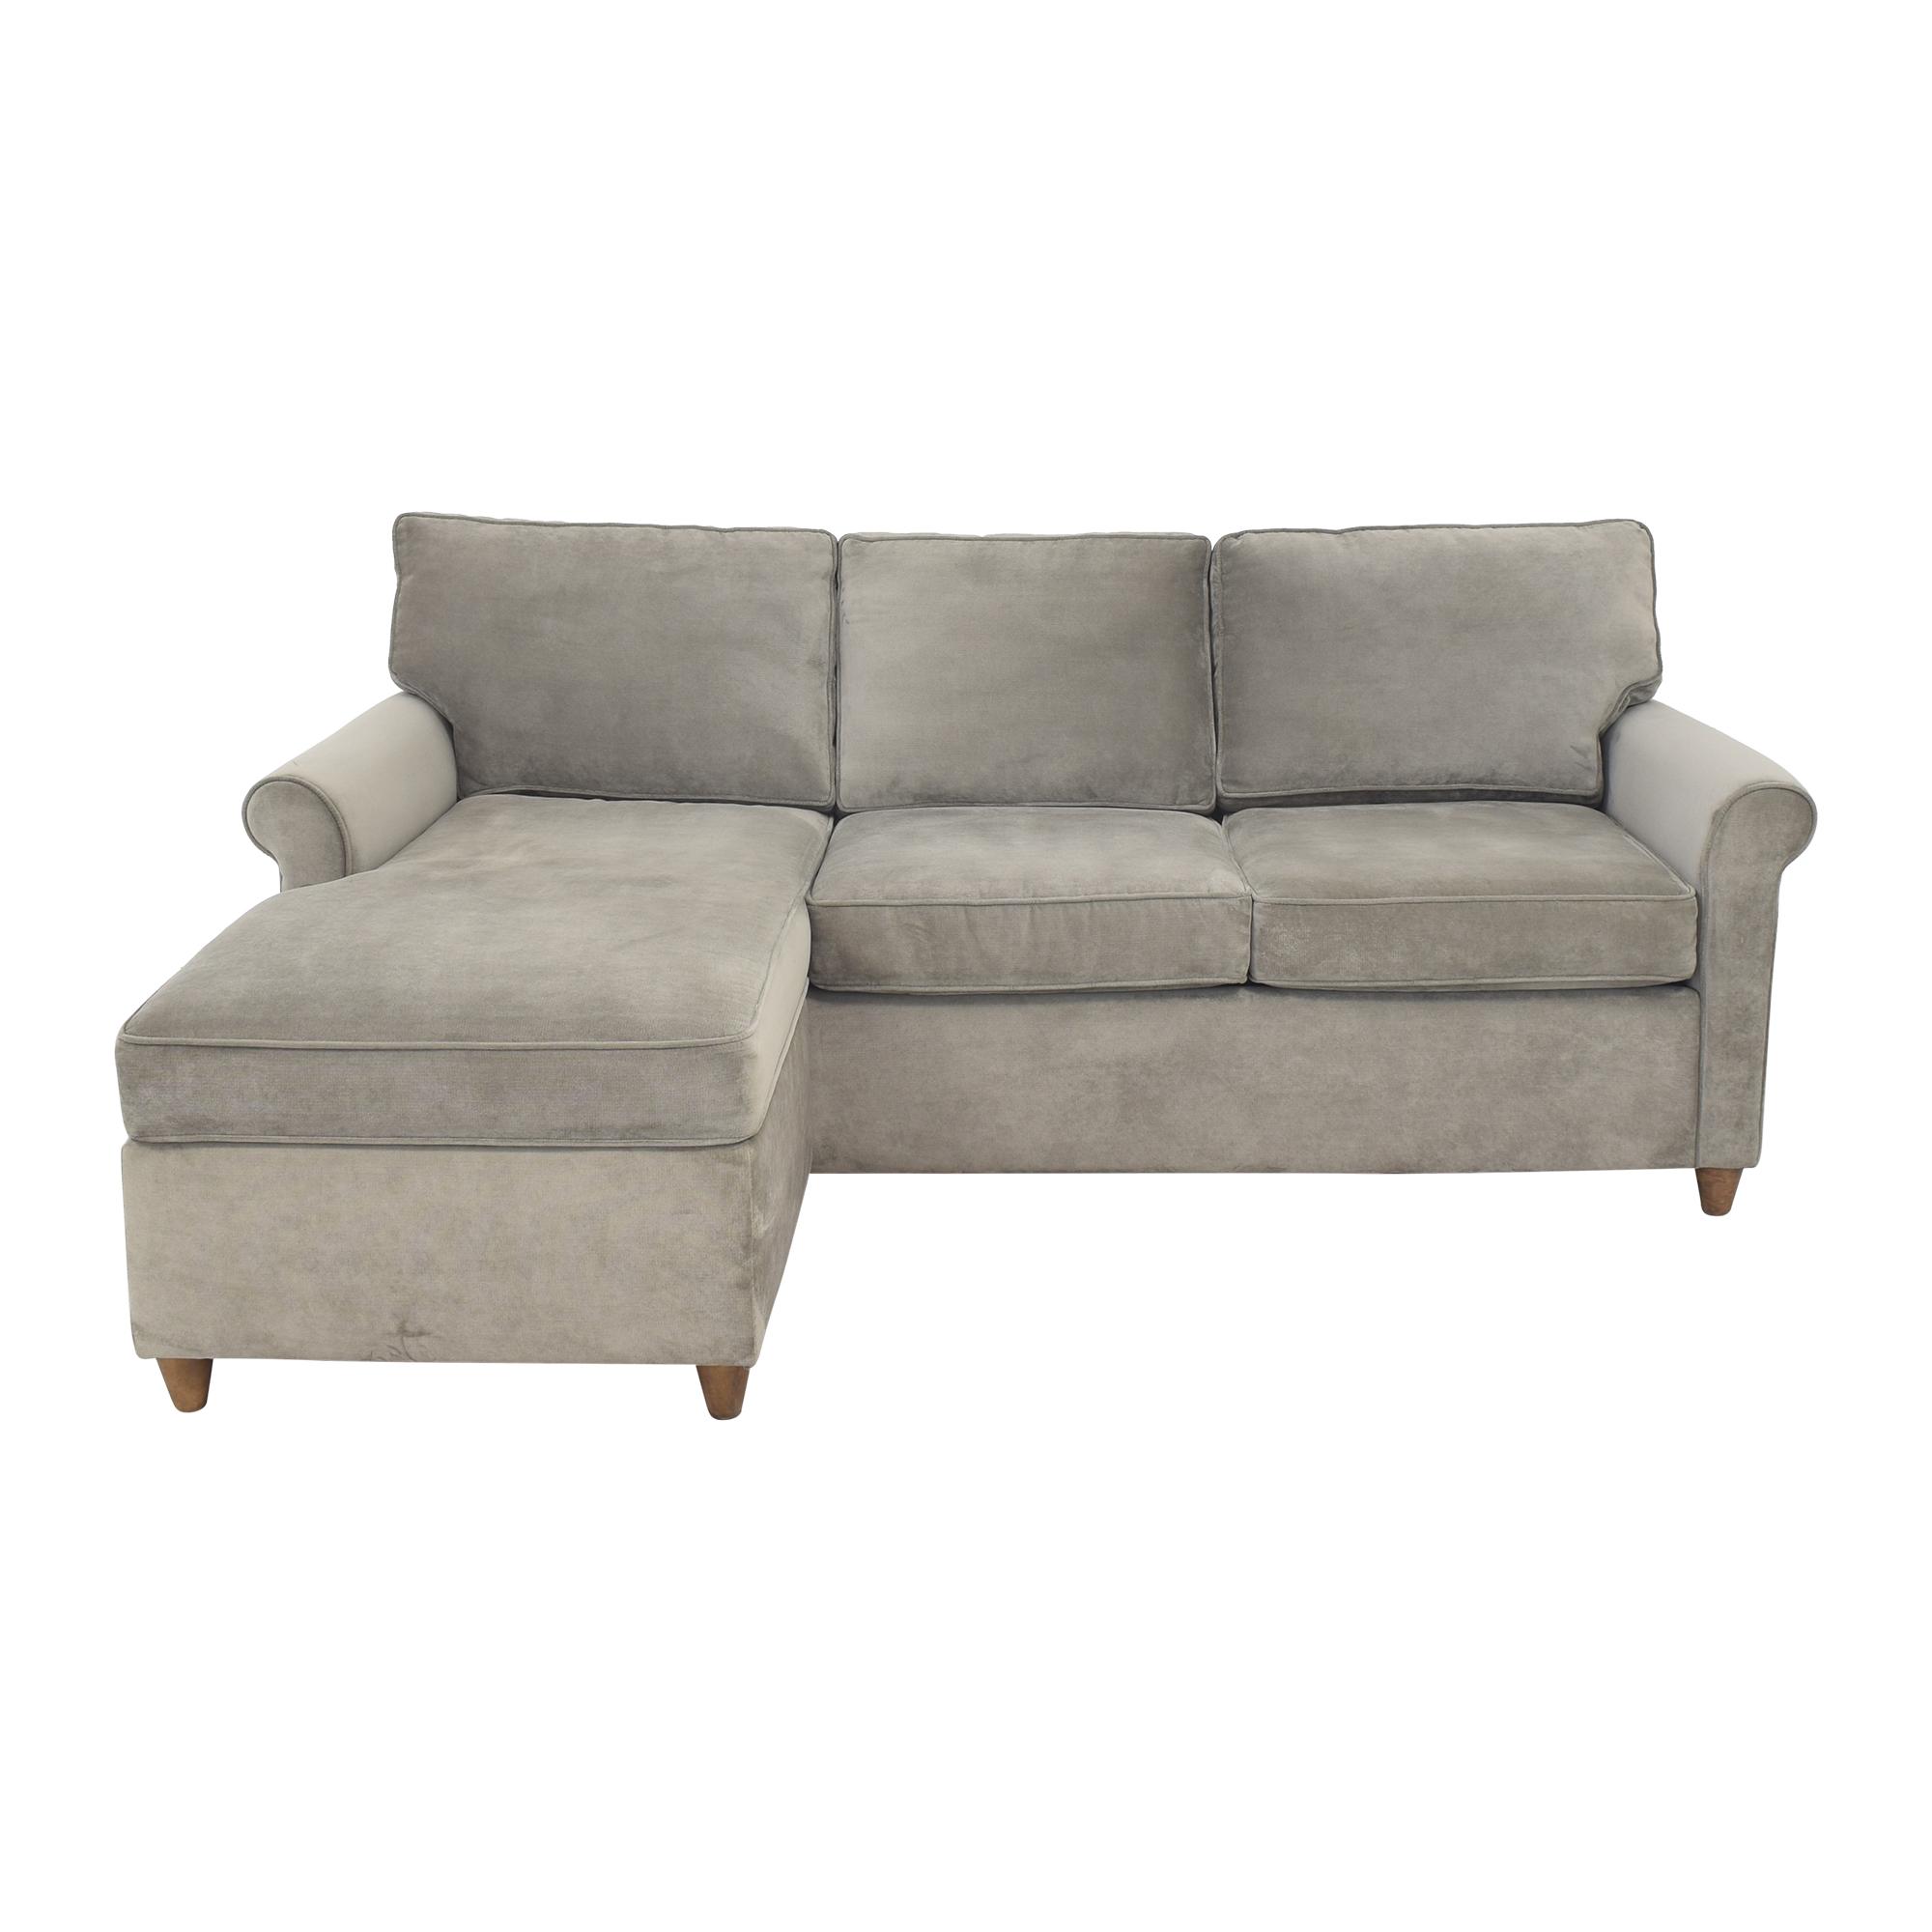 buy Macy's Reversible Sectional Sofa Macy's Sofas